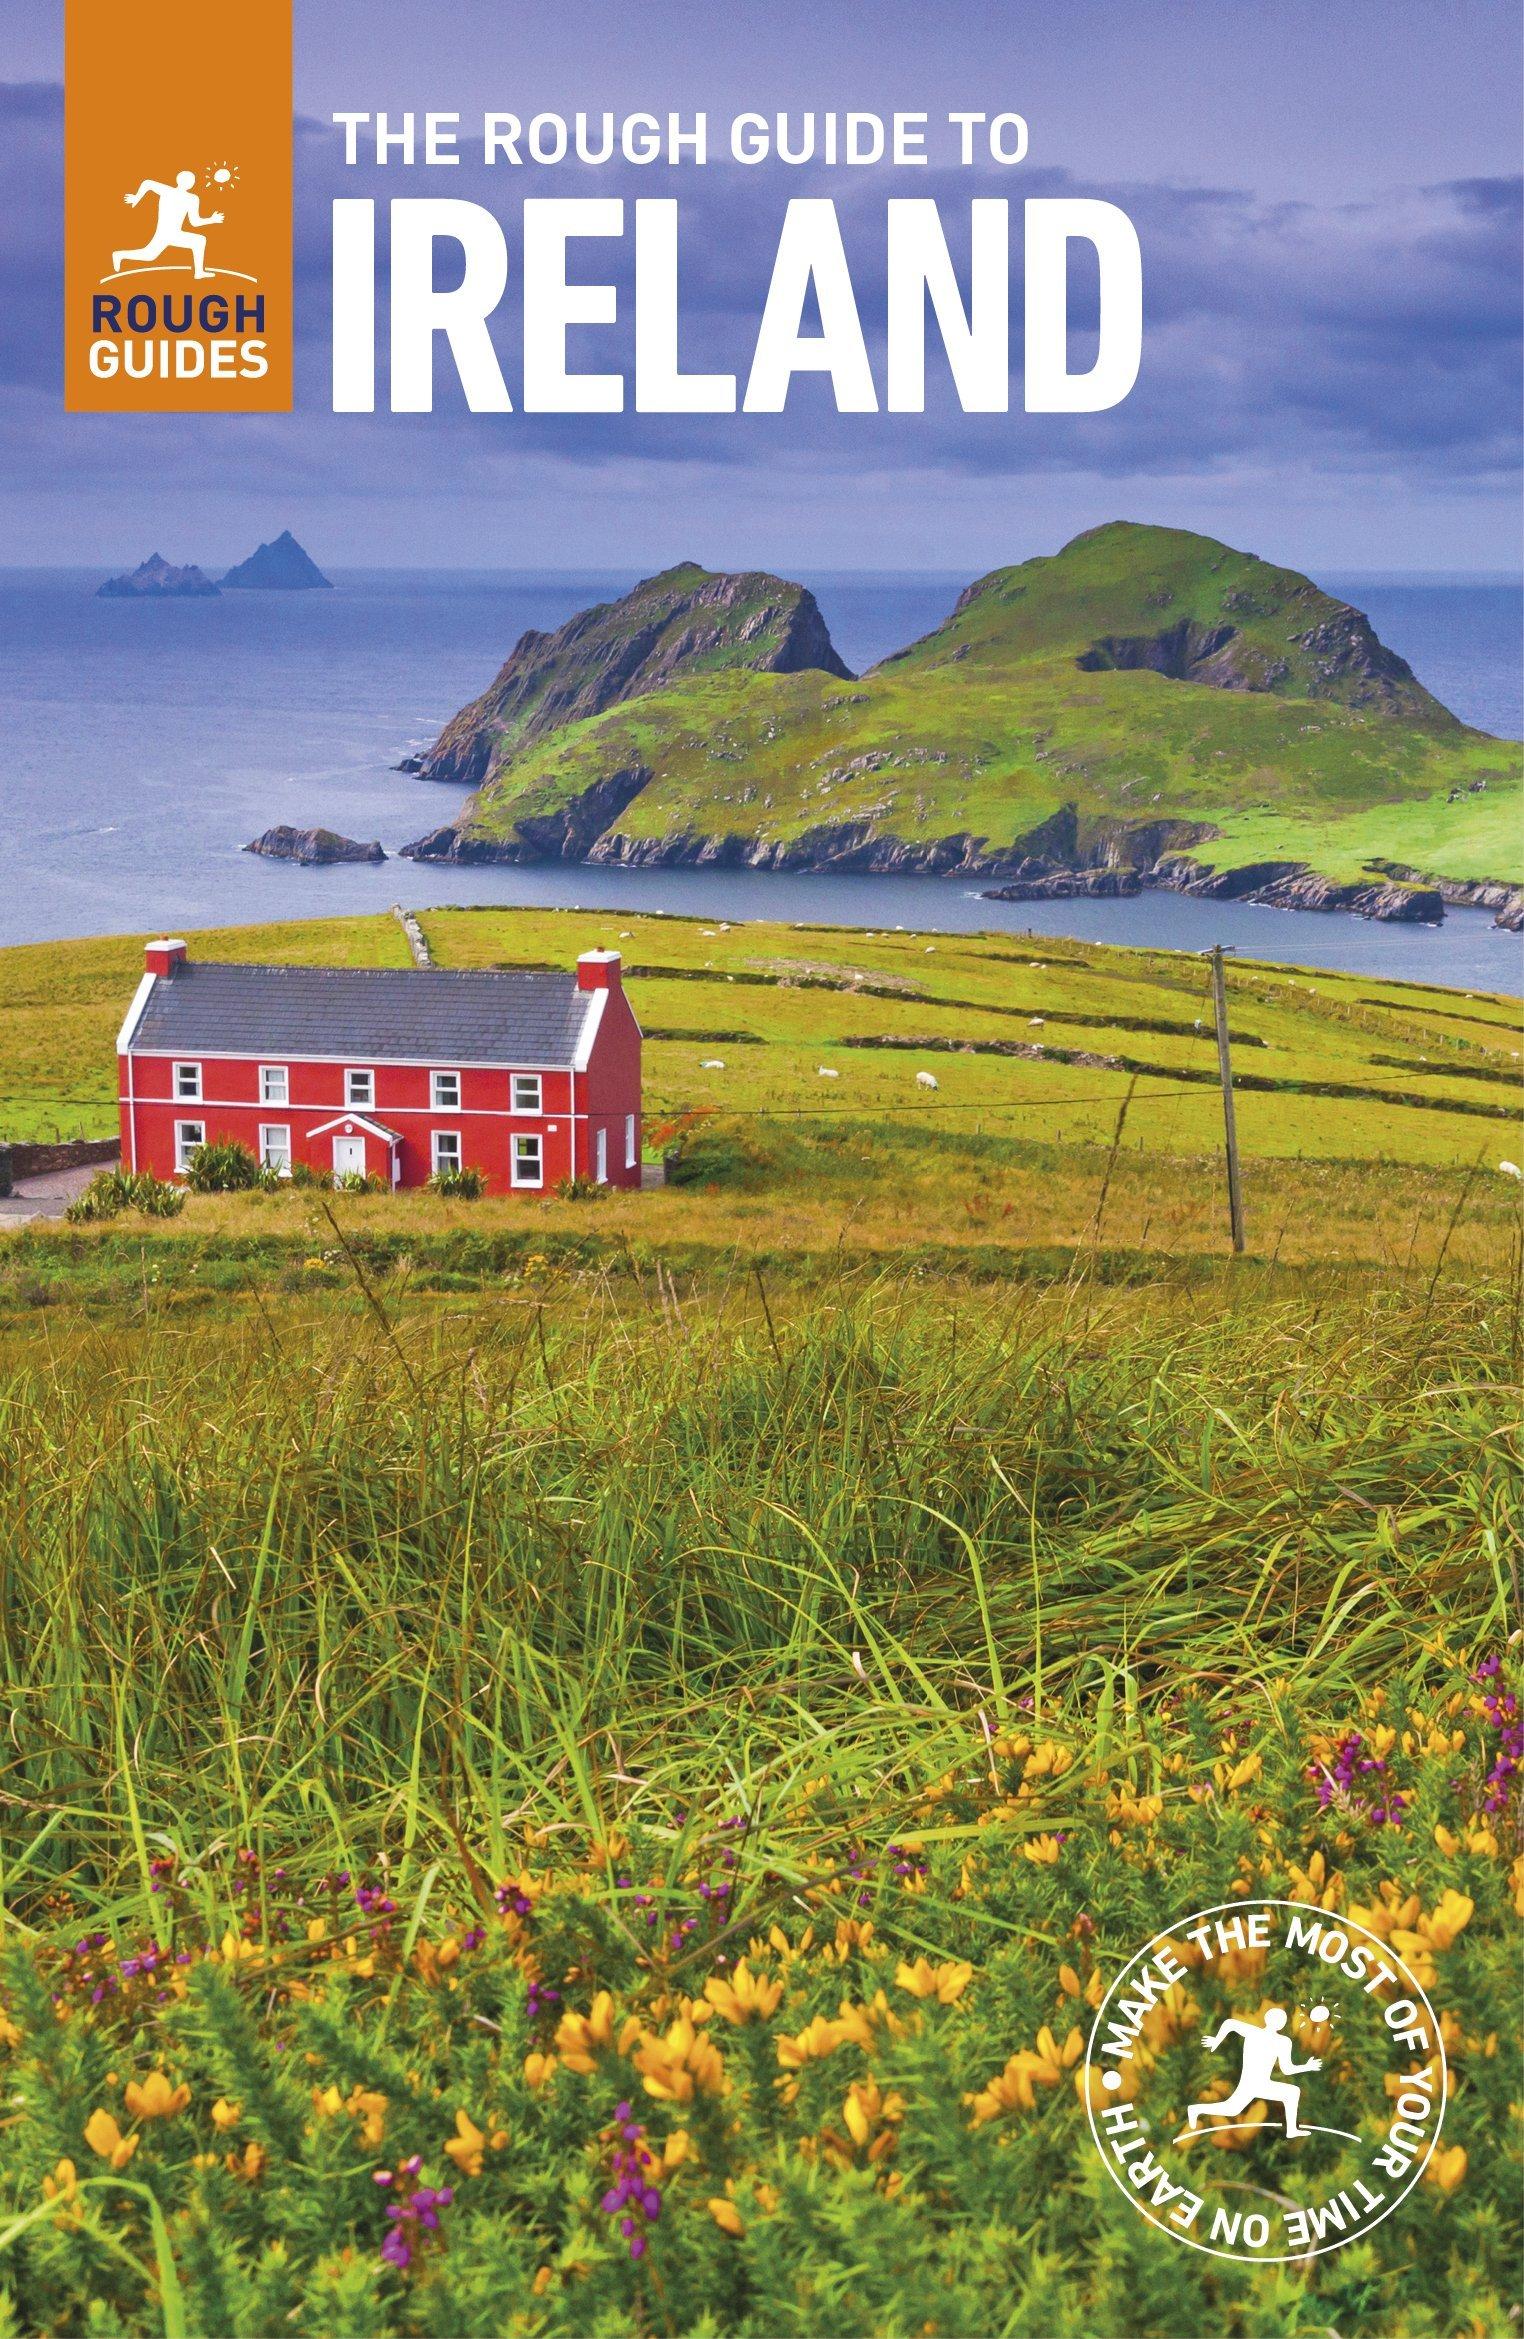 Rough Guide Ireland 9780241308783  Rough Guide Rough Guides  Reisgidsen Ierland